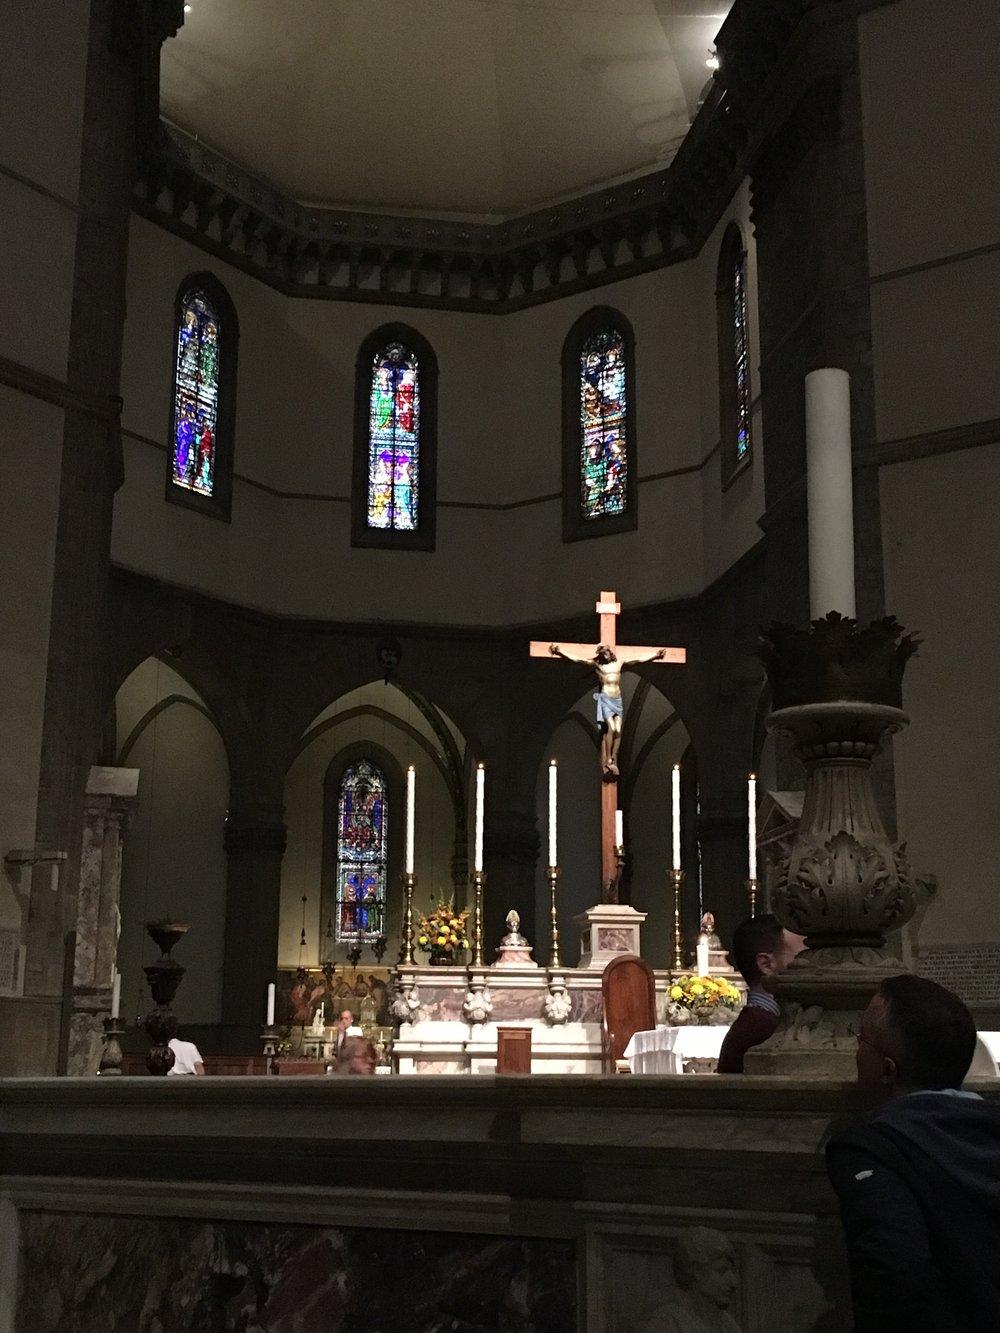 Main altar, Santa Maria del Fiore (Duomo), Florence